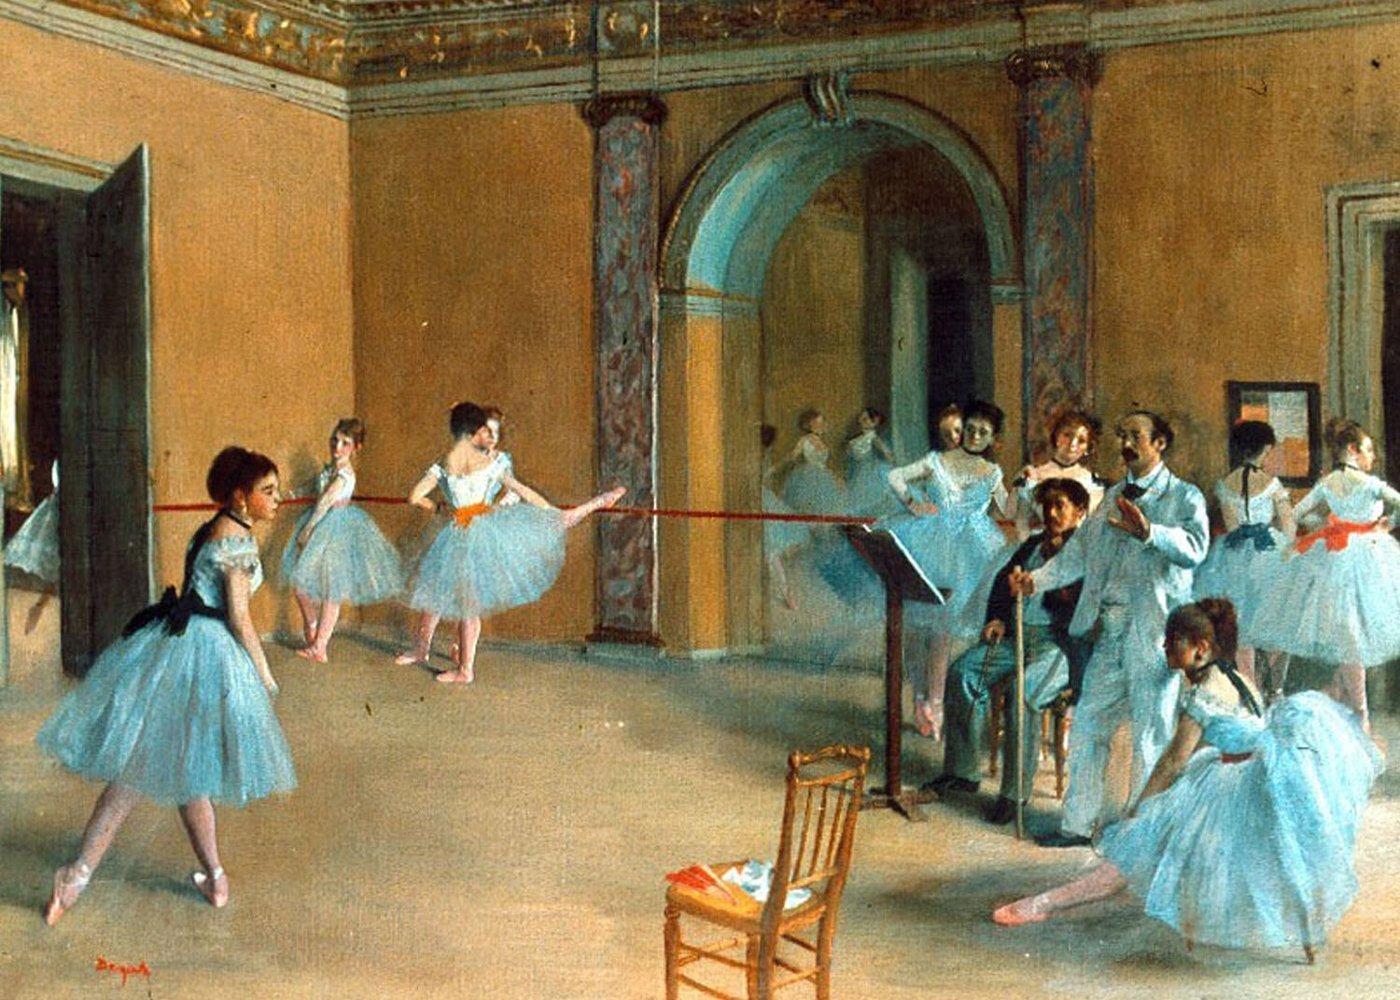 Movement & Matter: Celebrating the Dancing Body